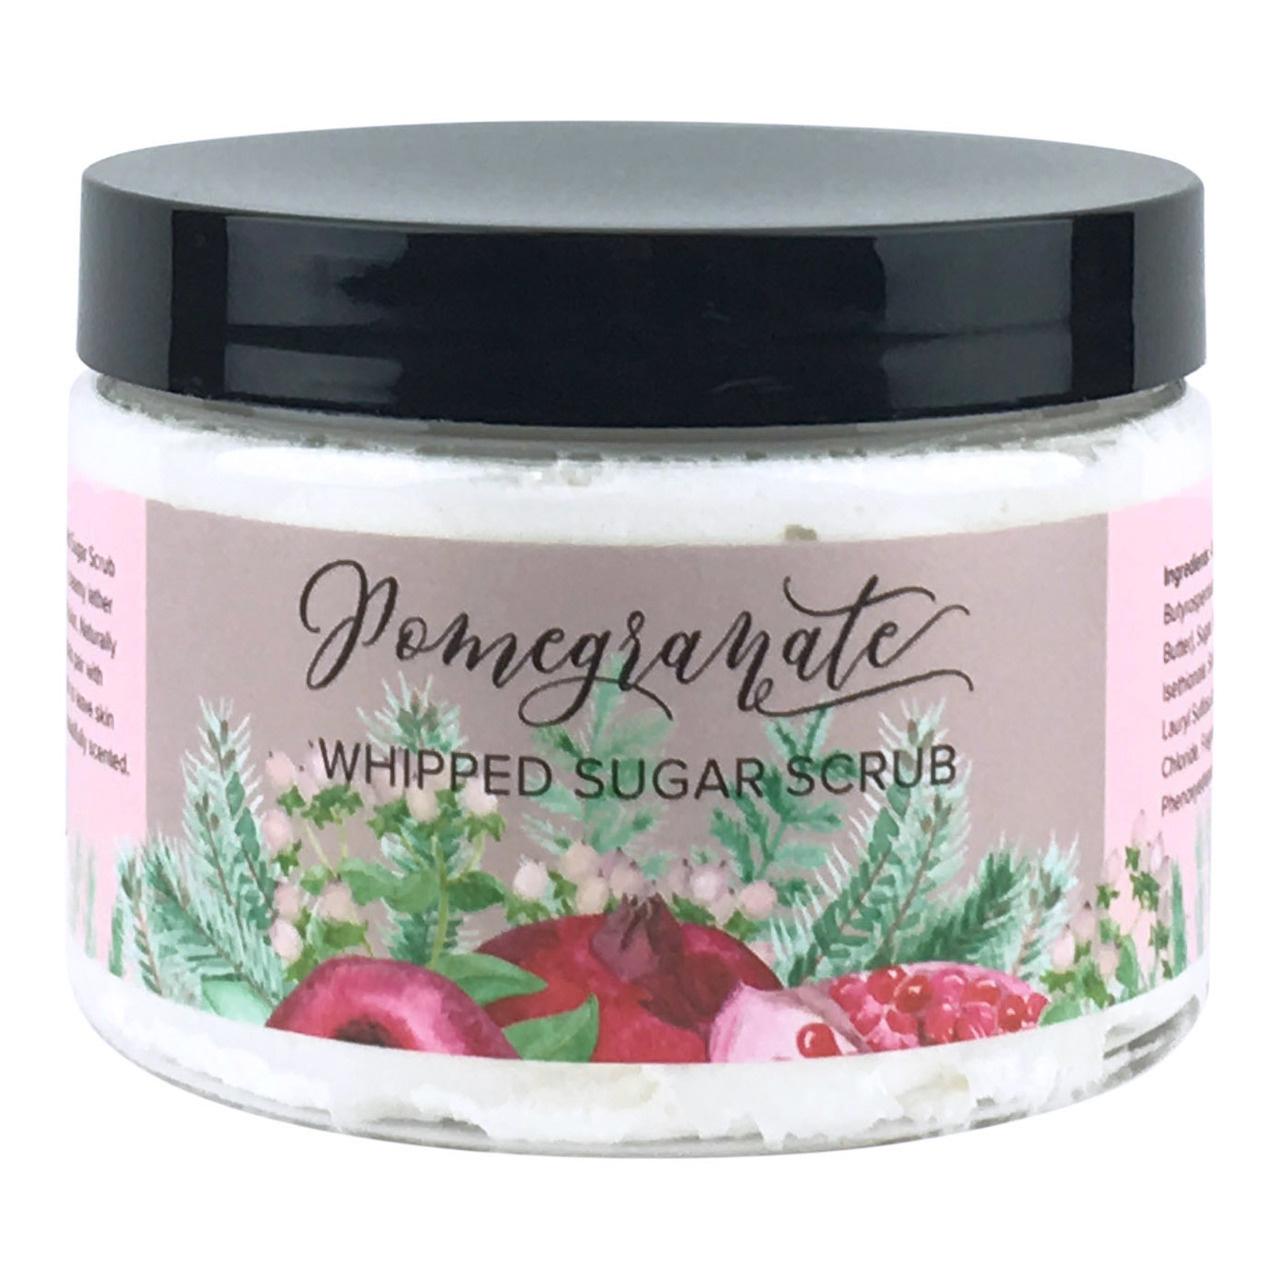 Whipped Sugar Scrub - Pomegranate-1